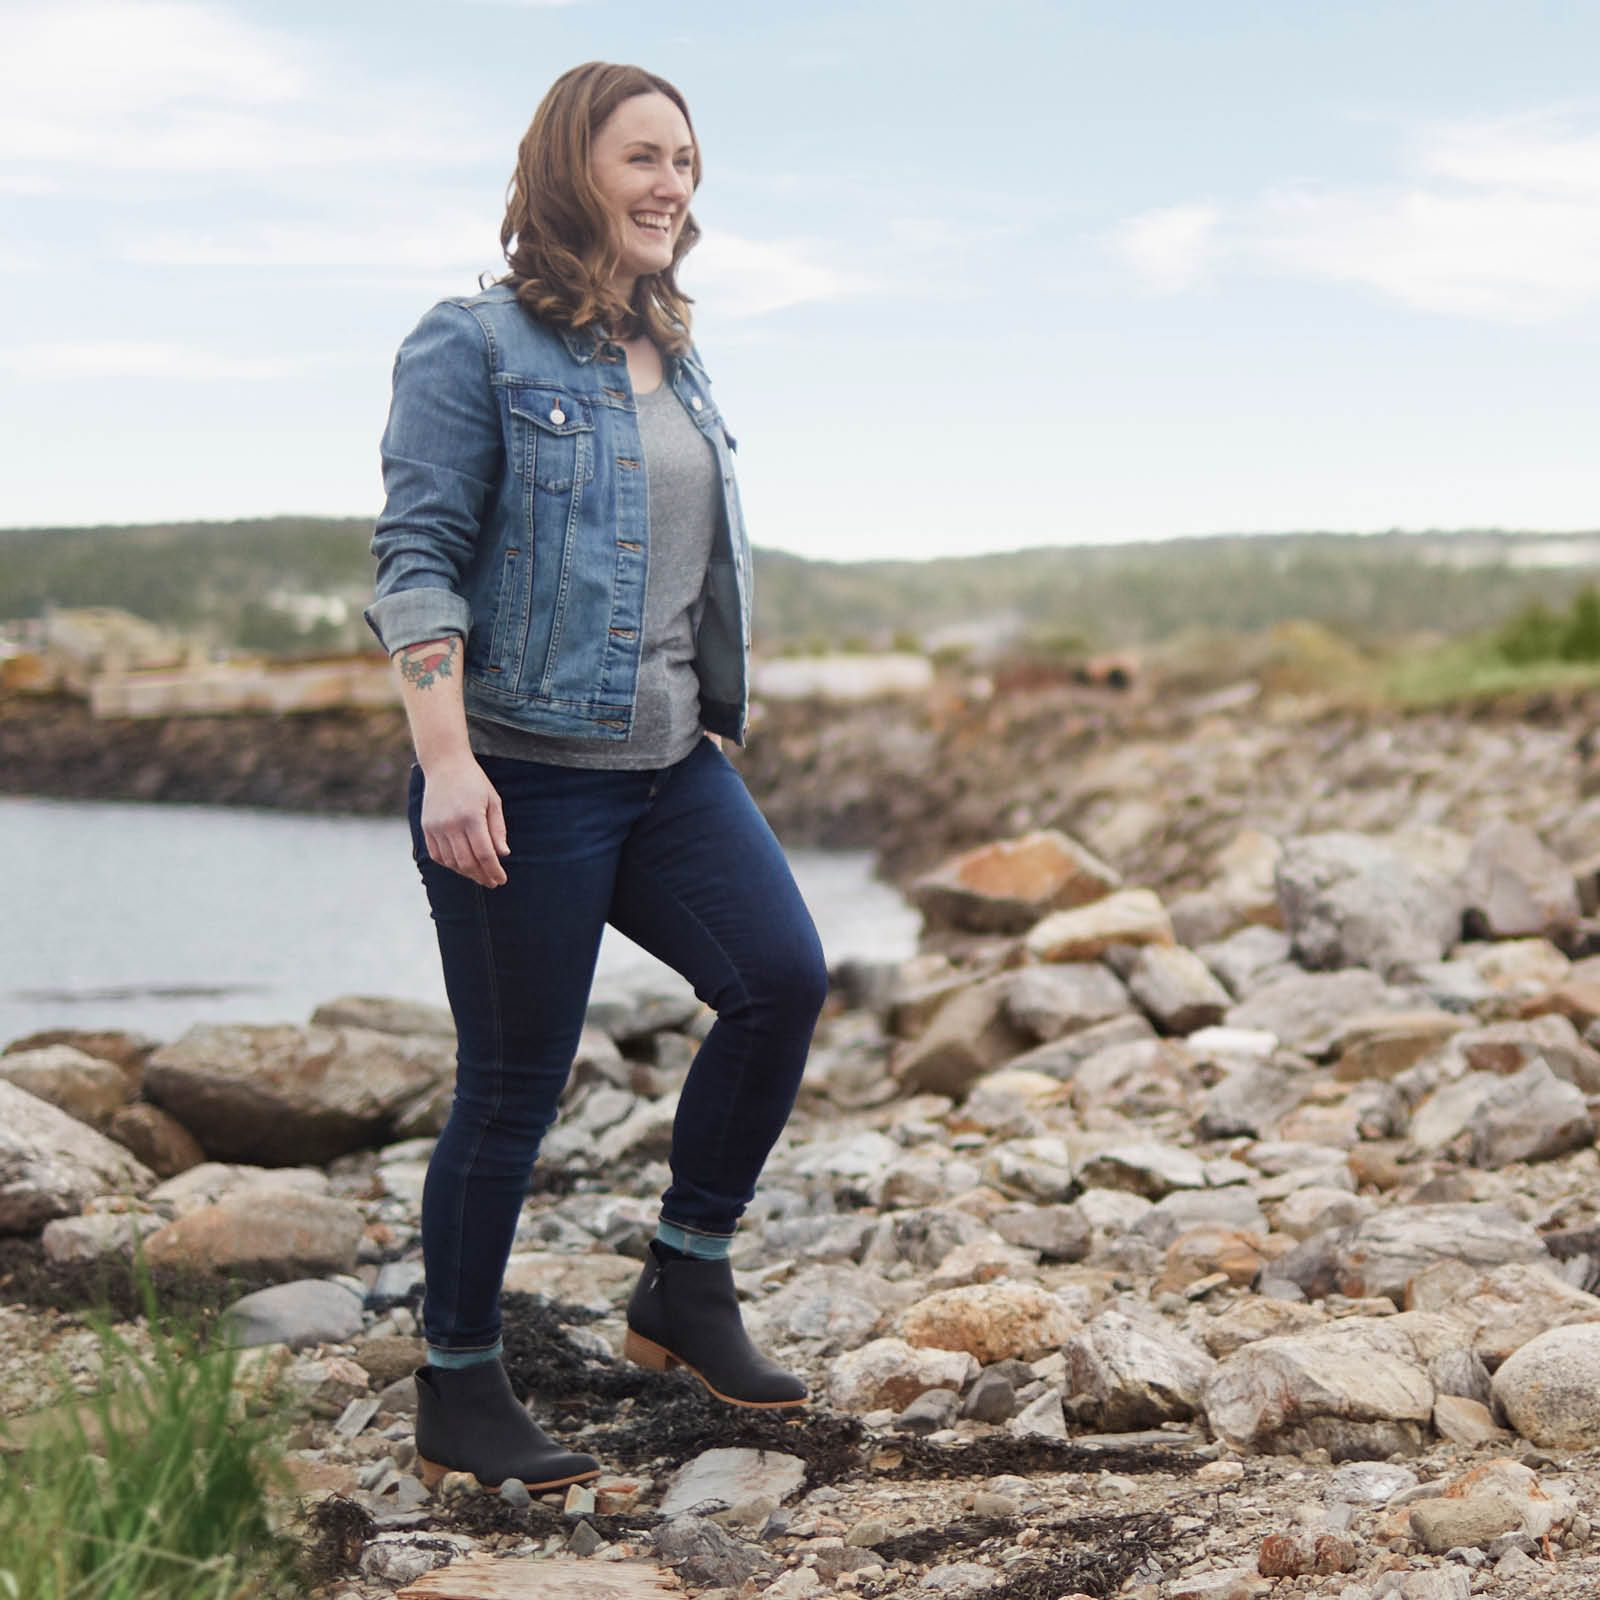 Jana Bookholt enjoying the water on a rocky beach.